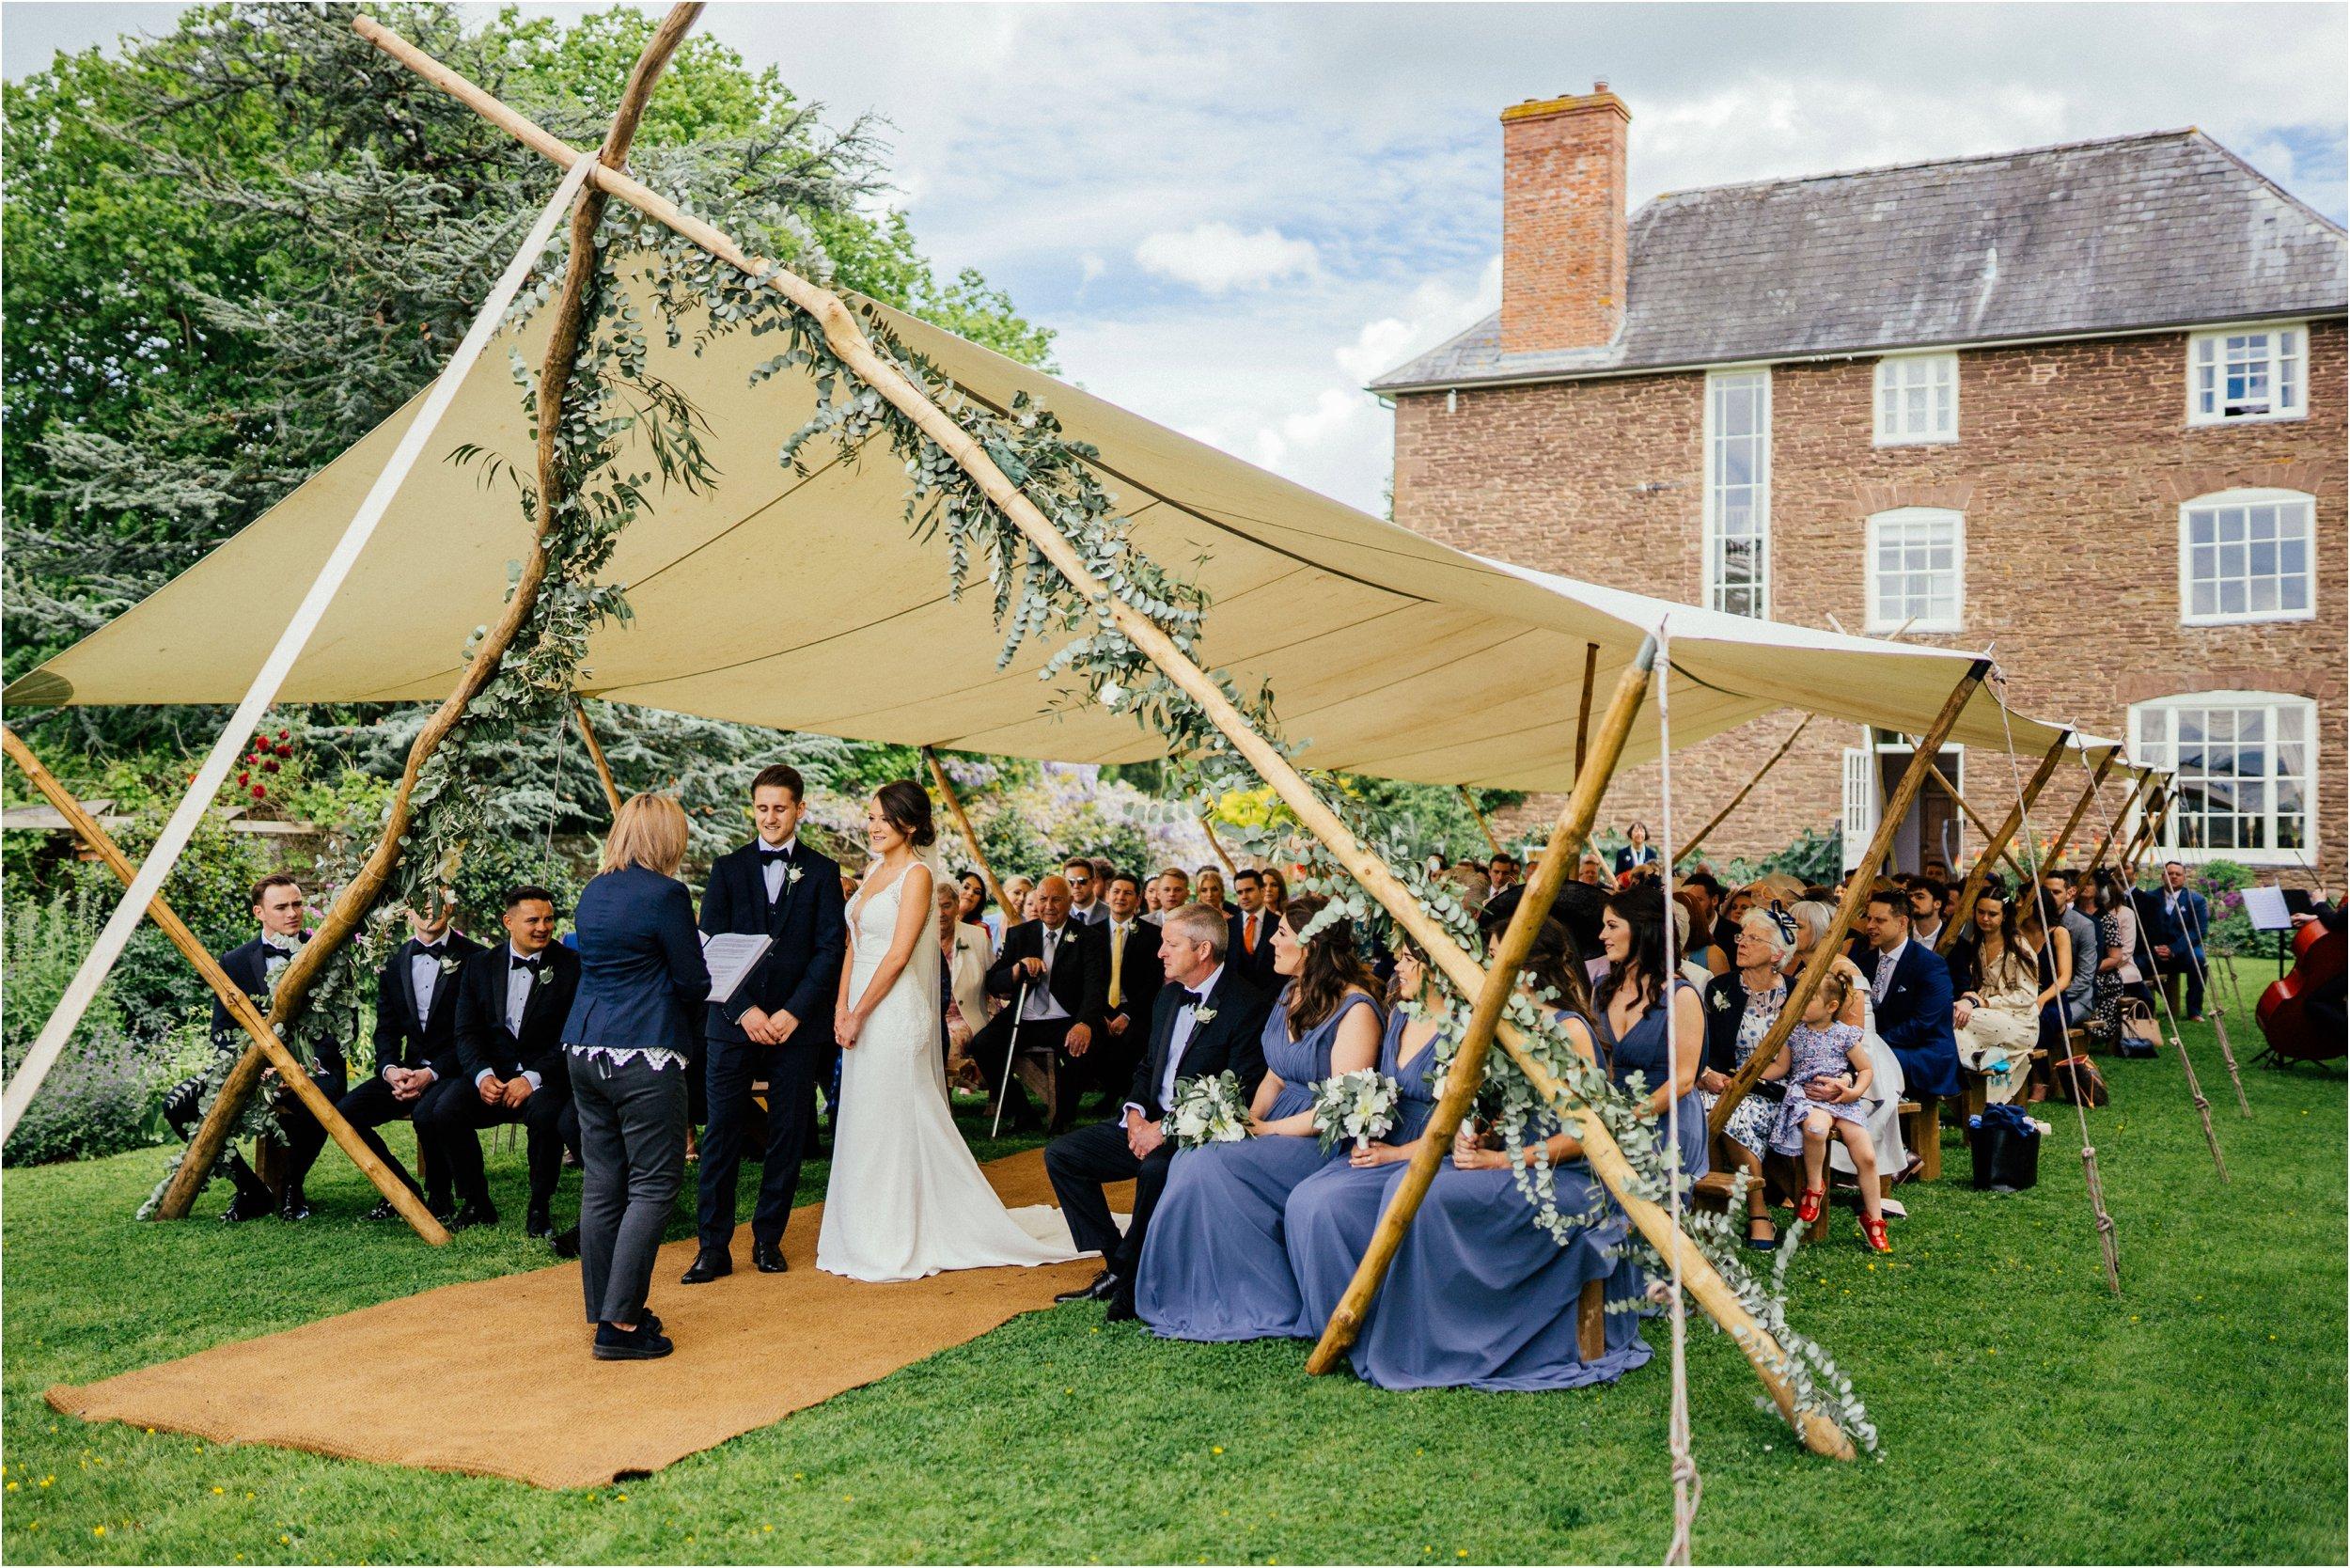 Dewsall Court Herefordshire wedding photographer_0037.jpg